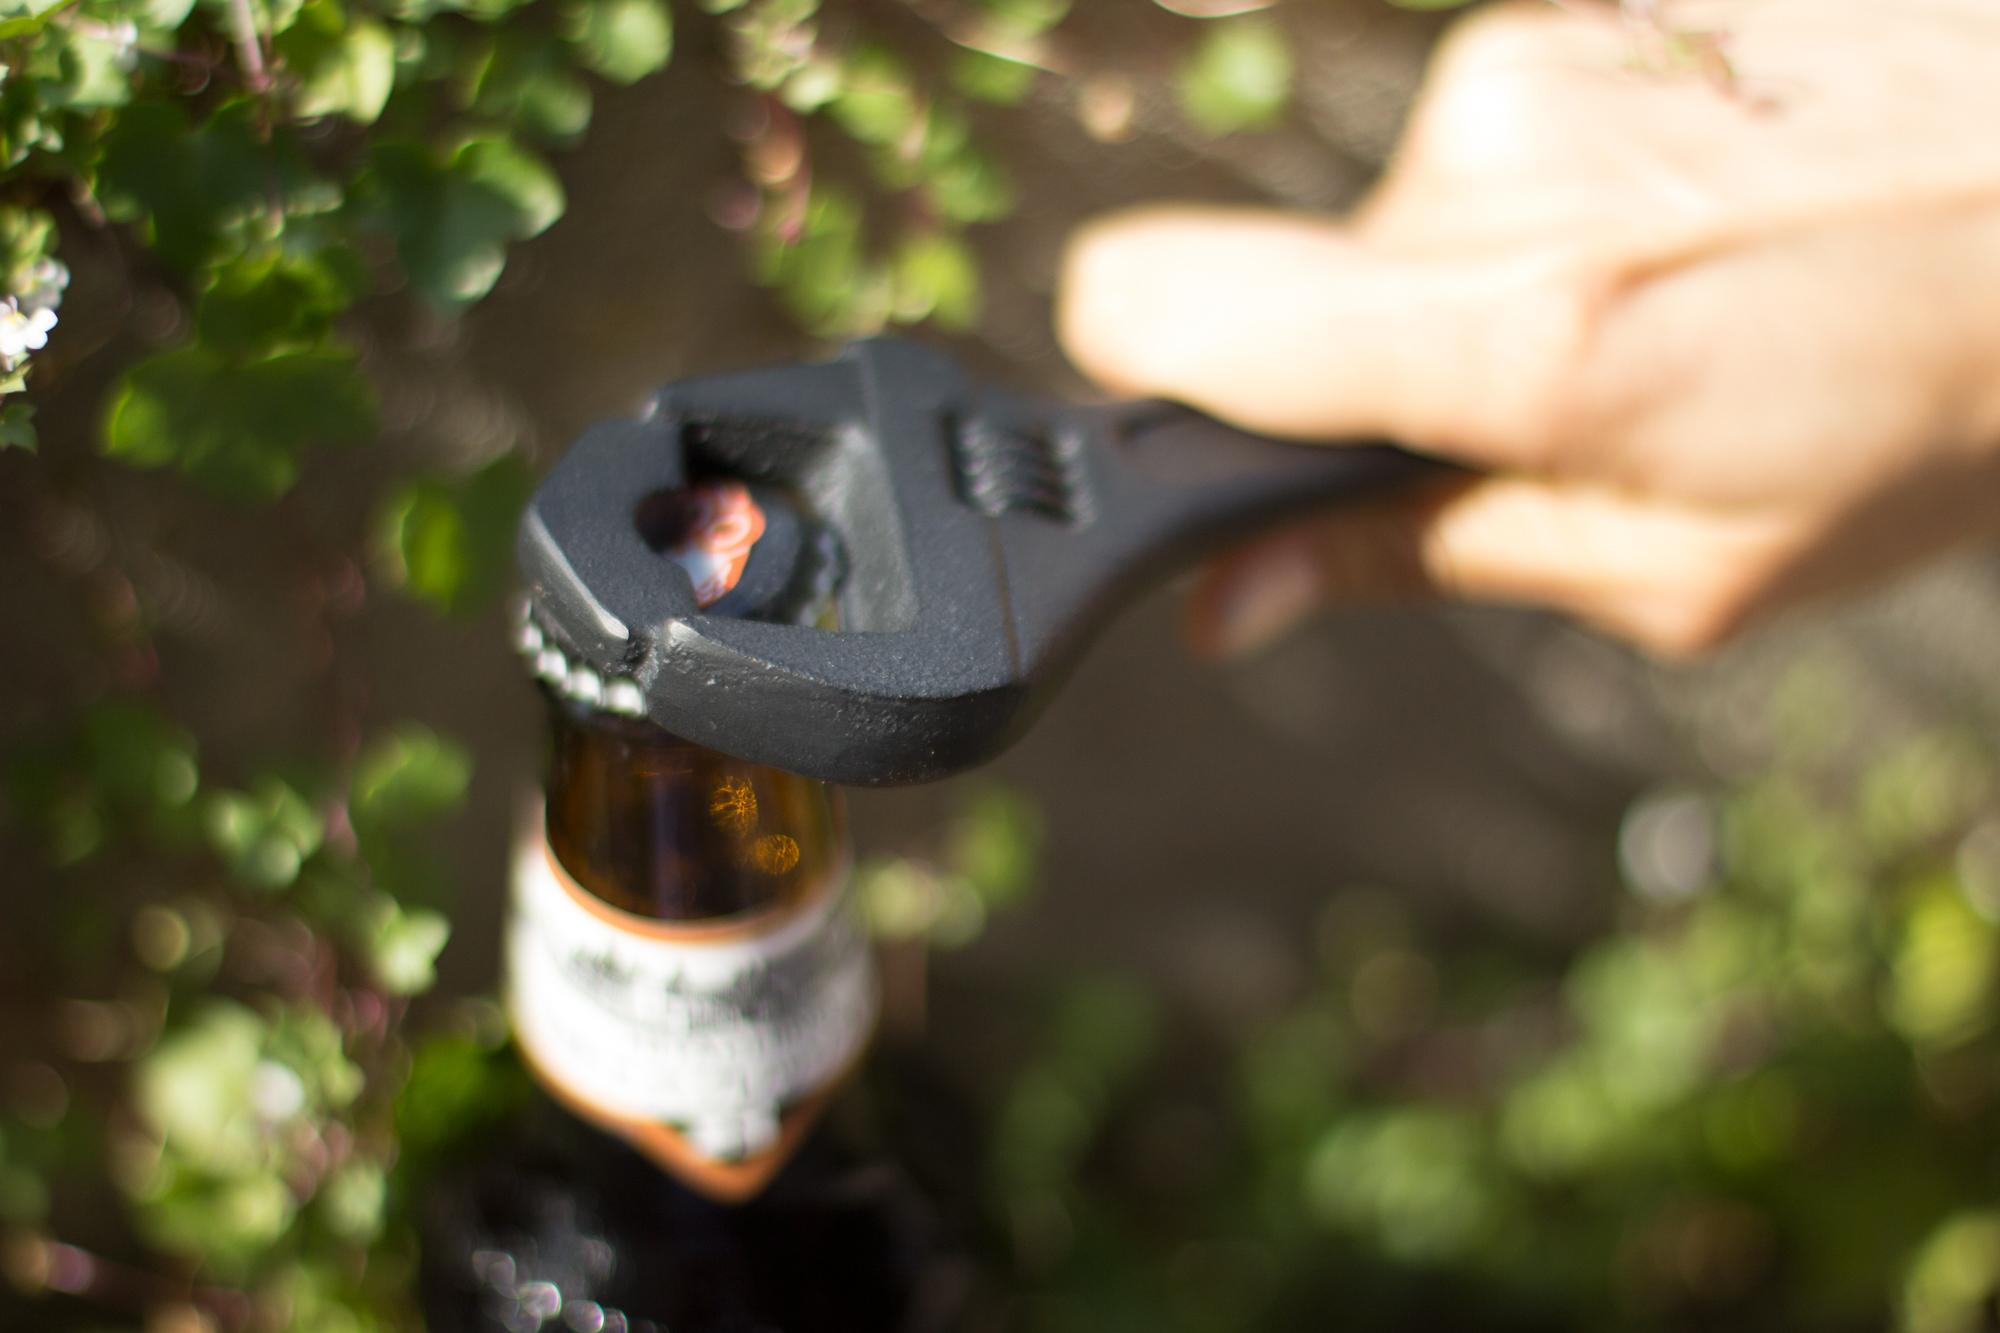 wrench cast iron bottle opener